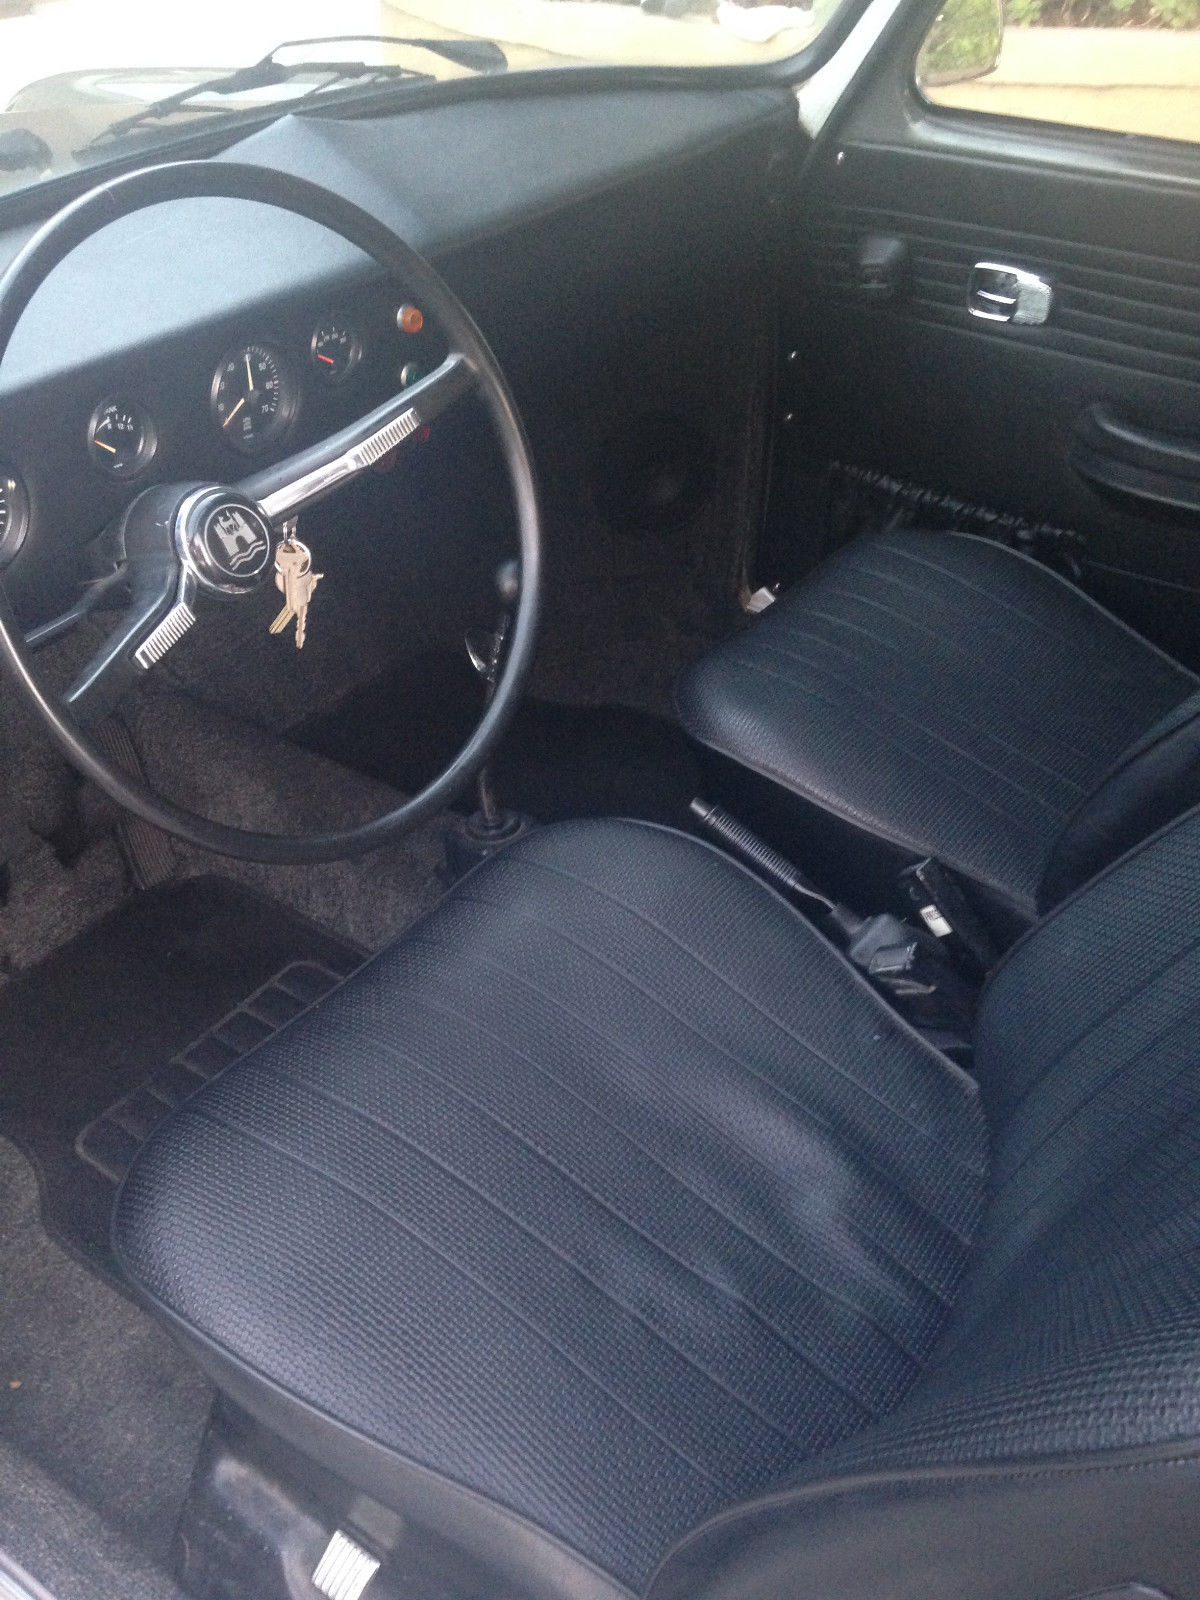 Find of the Day: Volkswagen Type 3 Squareback - VWVortex